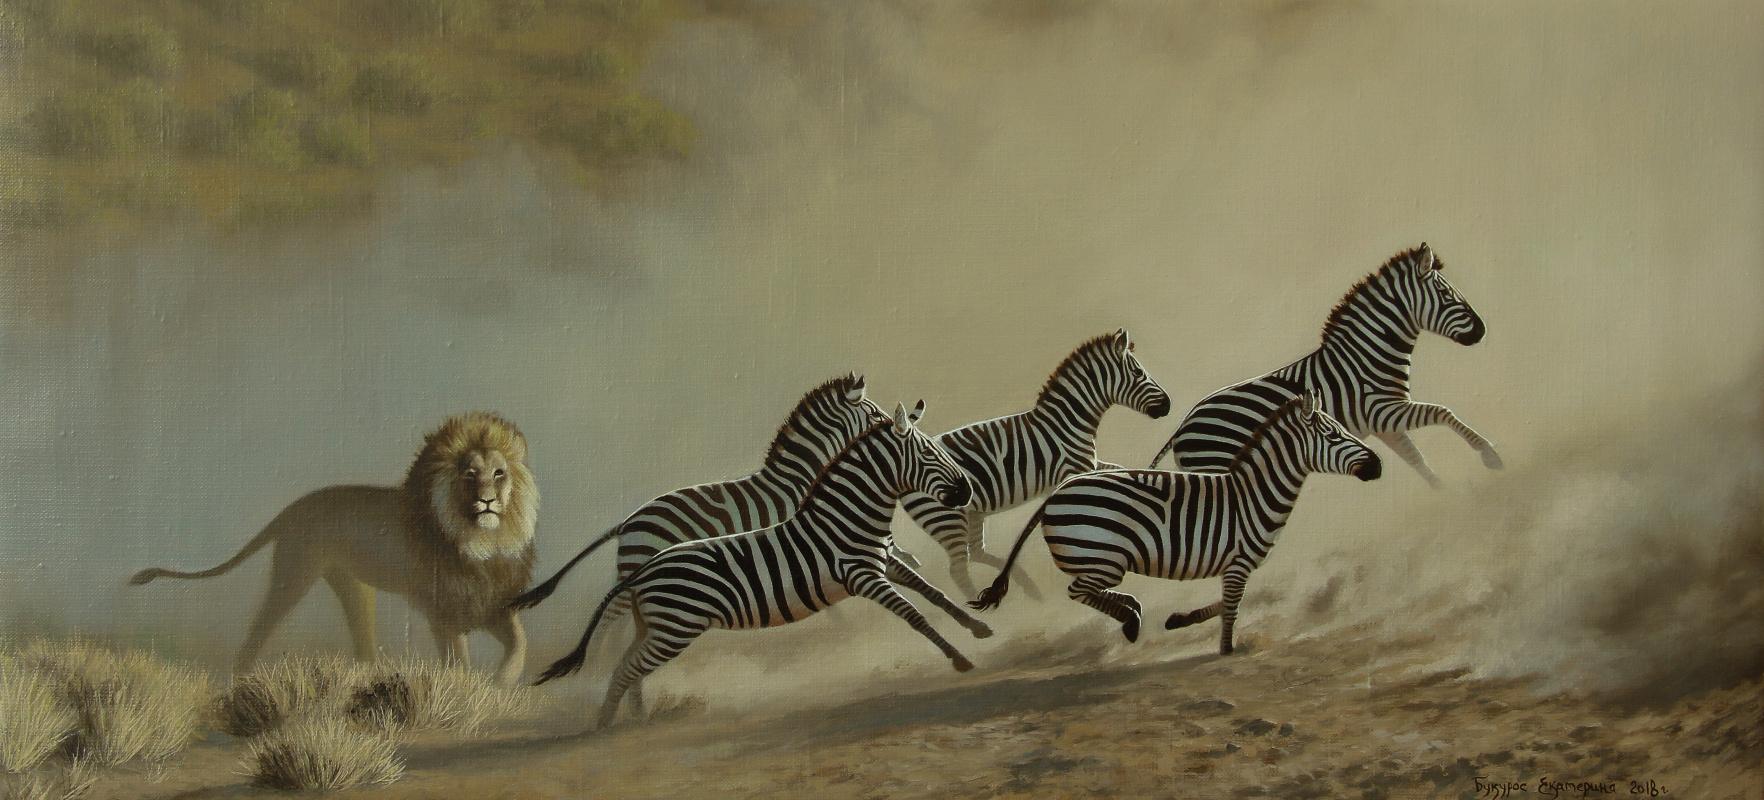 Katerina Bukuros. Лев и его зебры